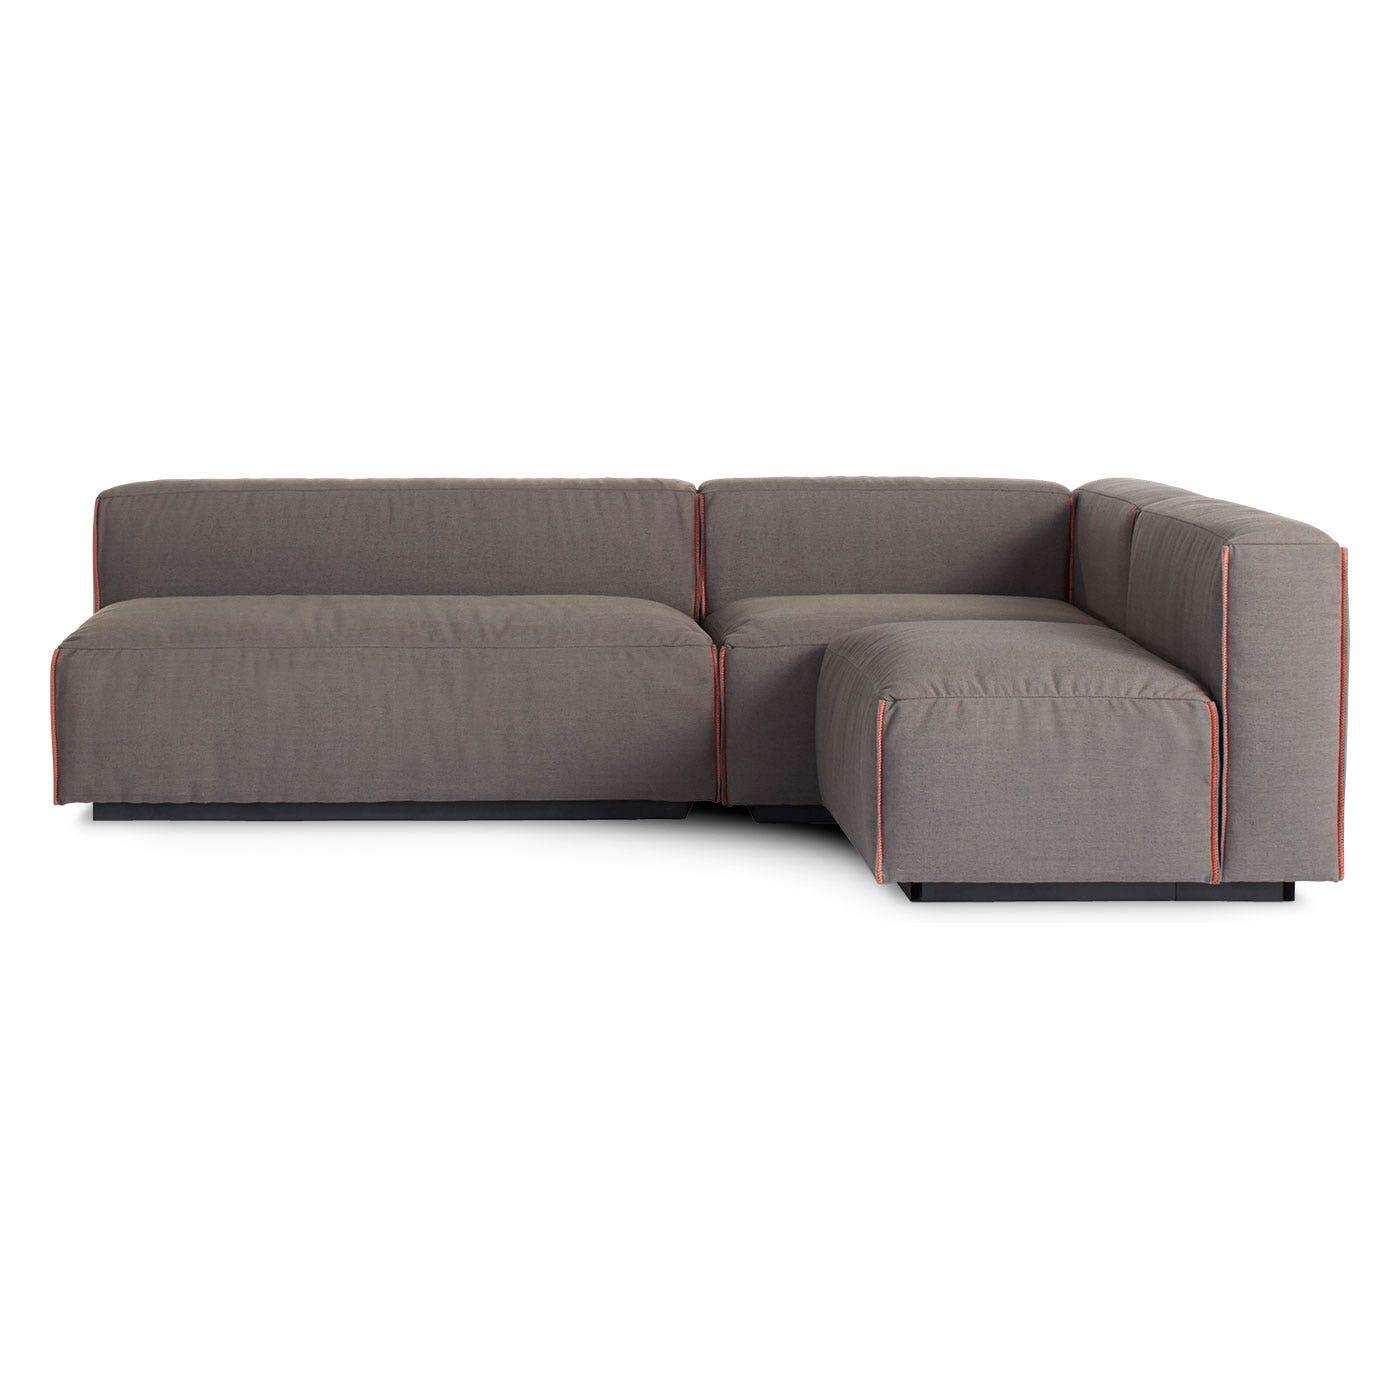 Cleon Medium Sectional Sofa  sc 1 st  Blu Dot : armless sectionals - Sectionals, Sofas & Couches